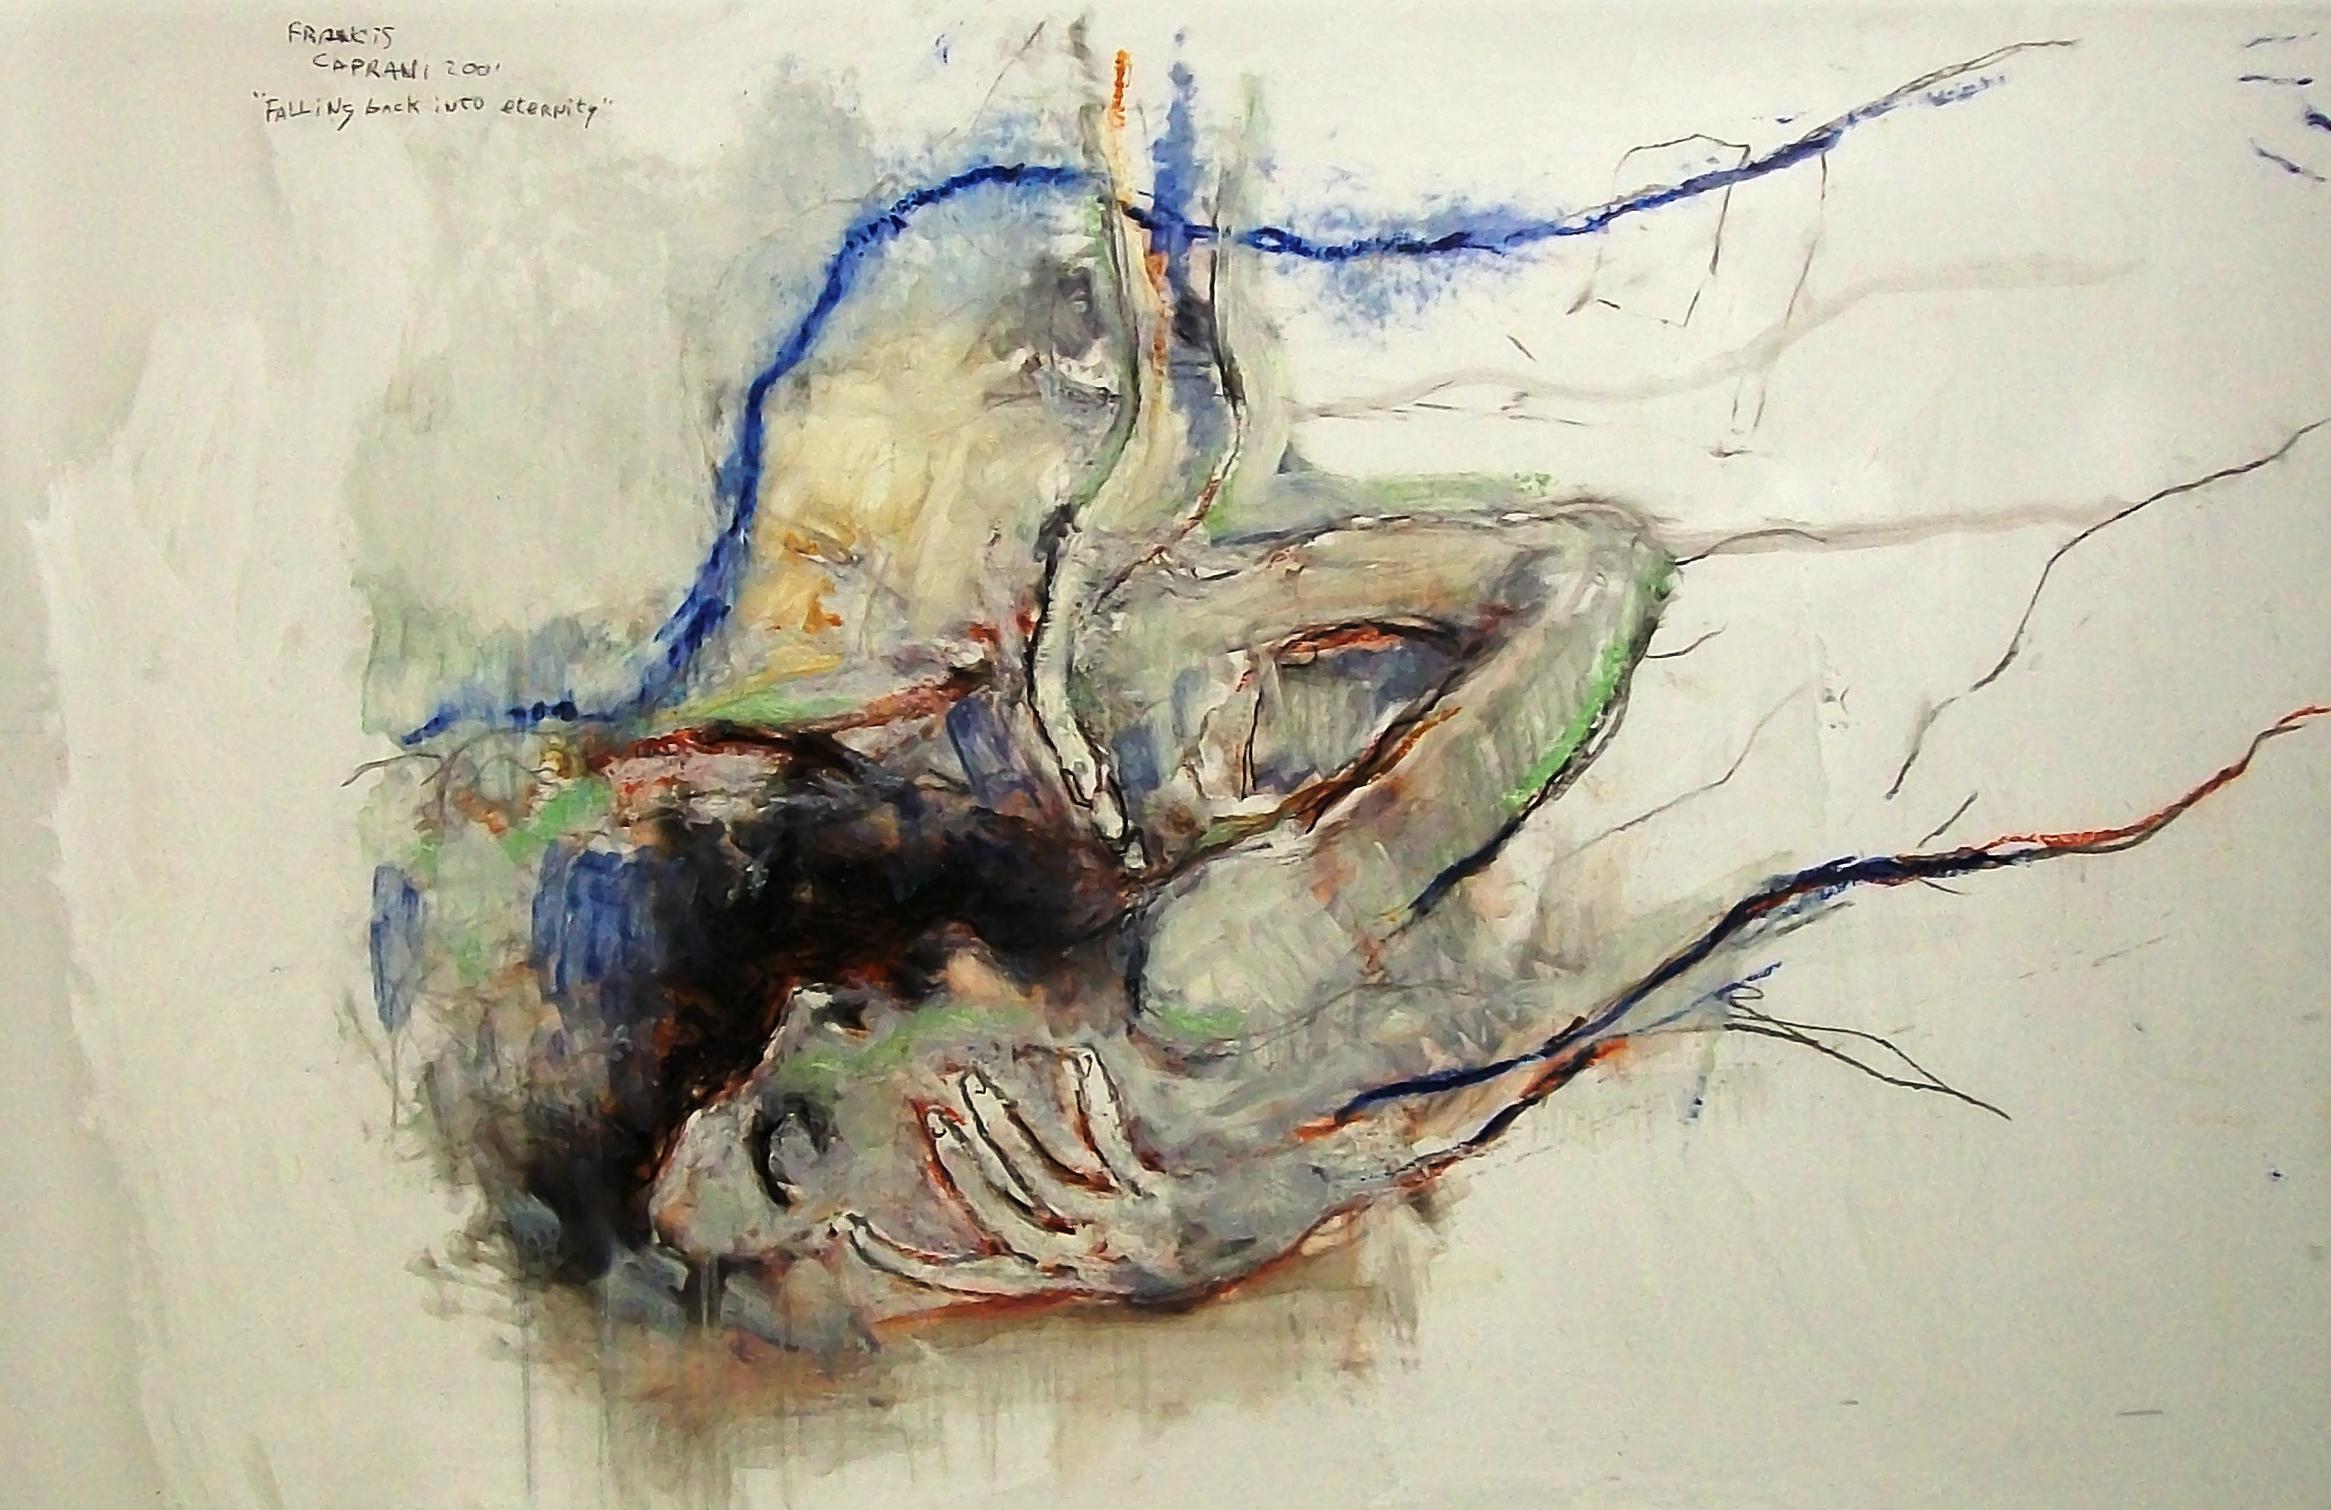 Francis Caprani, Falling Back into Eternity, Acrylic on mylar, 2001, 80x123cm